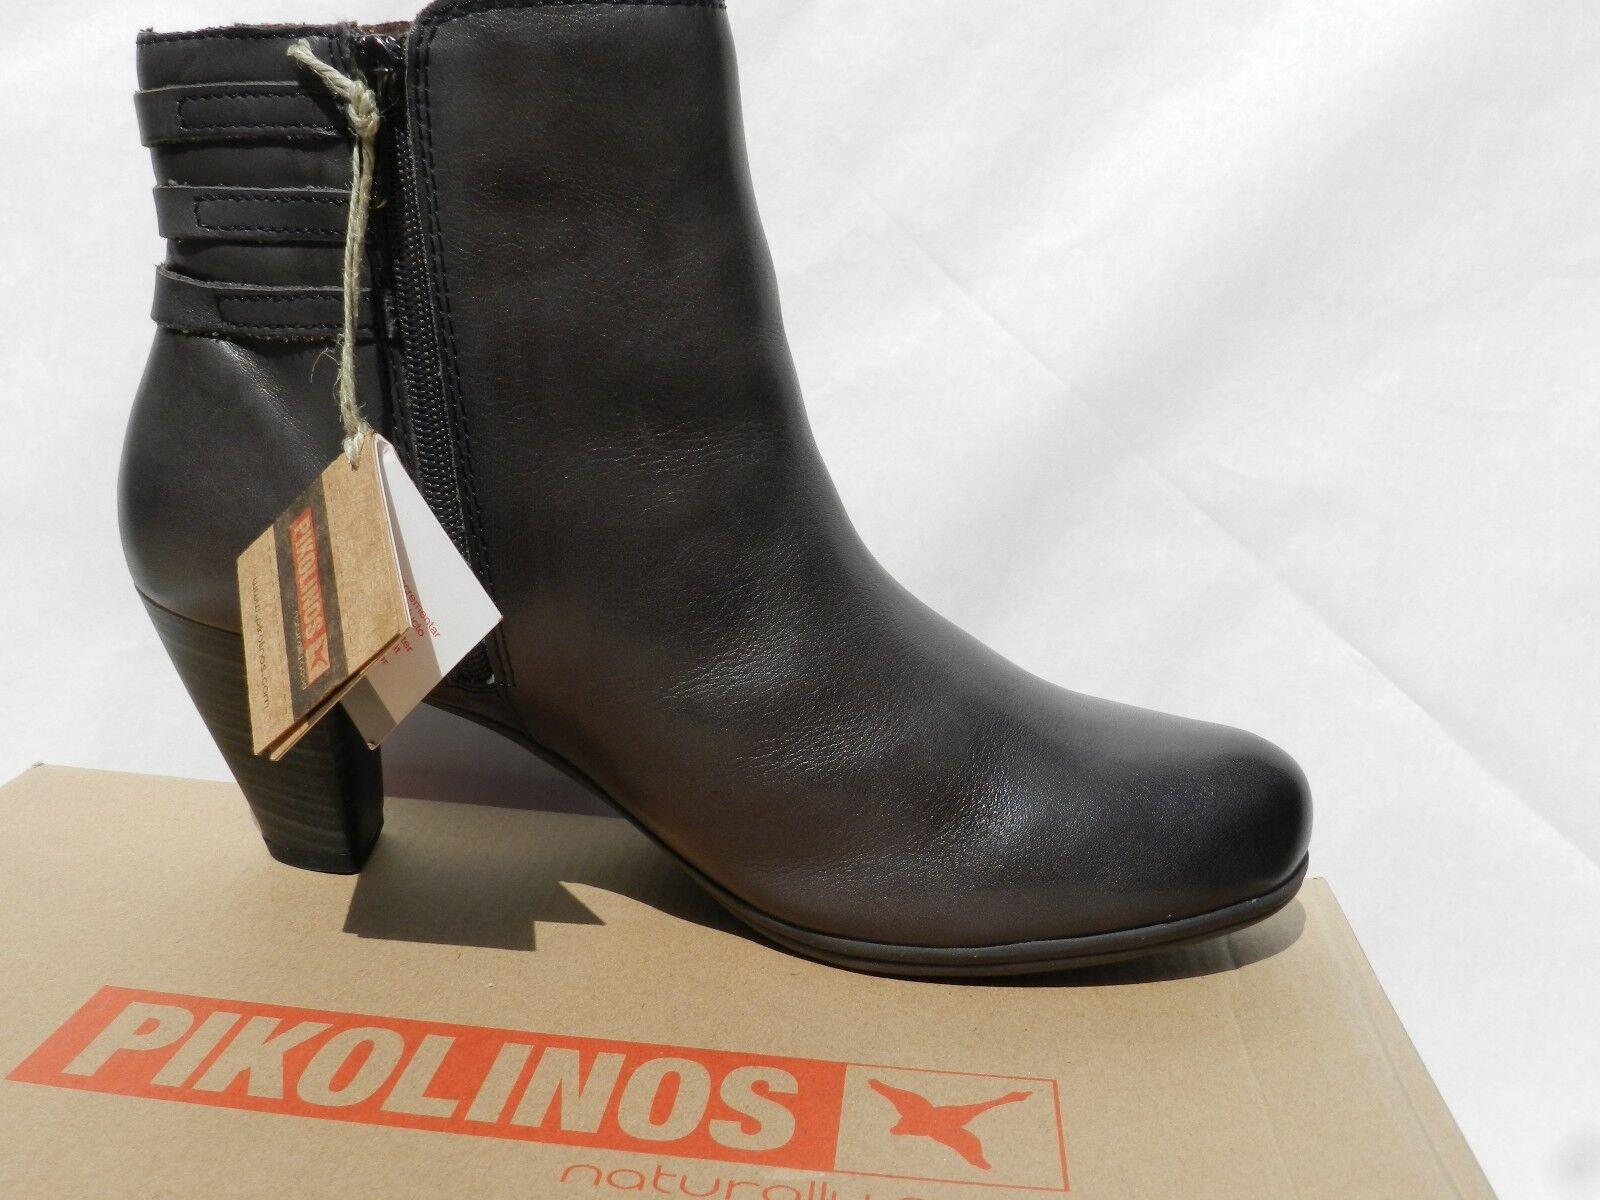 Pikolinos Verona 829 Chaussures Femme 41 7247 7247 7247 Bottines Ankle Boots Grey UK4 Neuf ca7f98